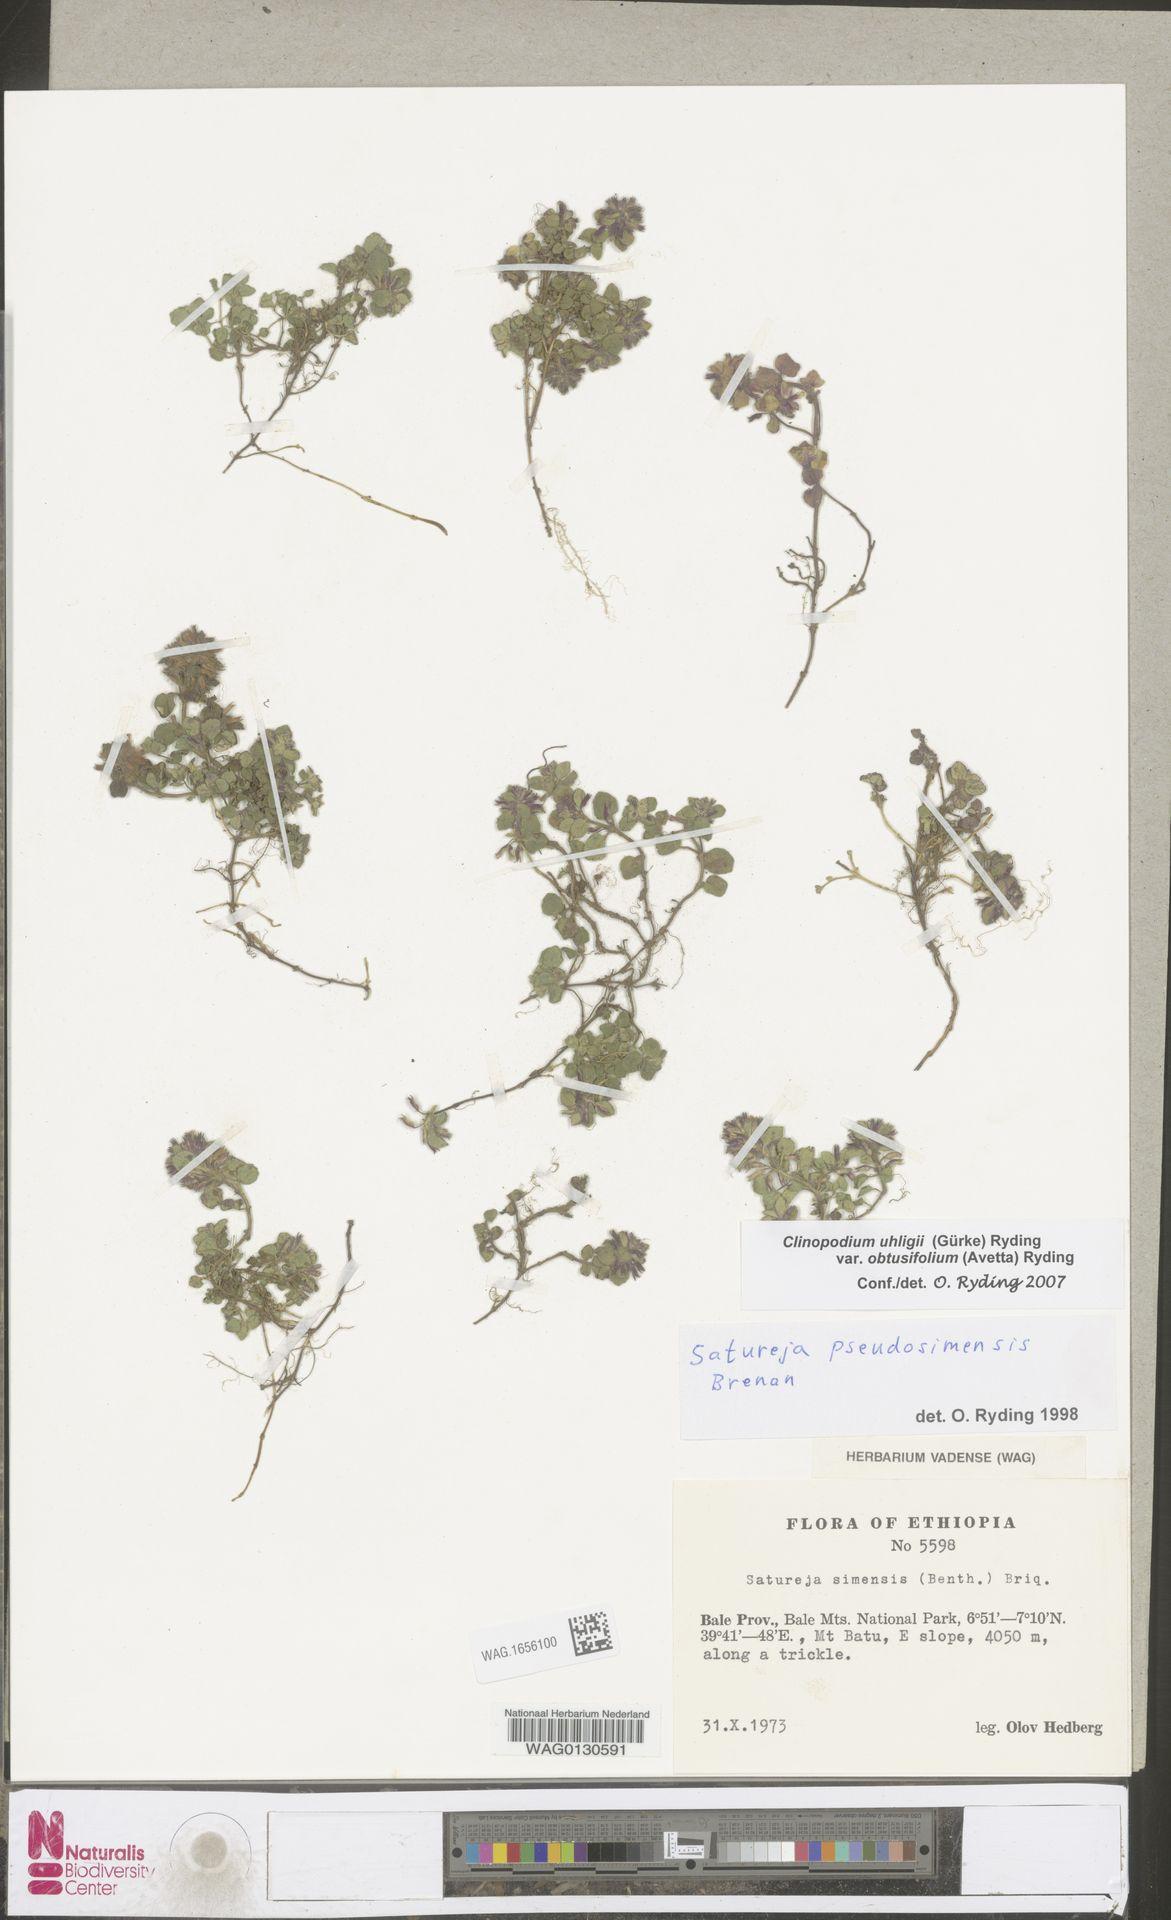 WAG.1656100 | Clinopodium uhligii var. obtusifolium (Avetta) Ryding